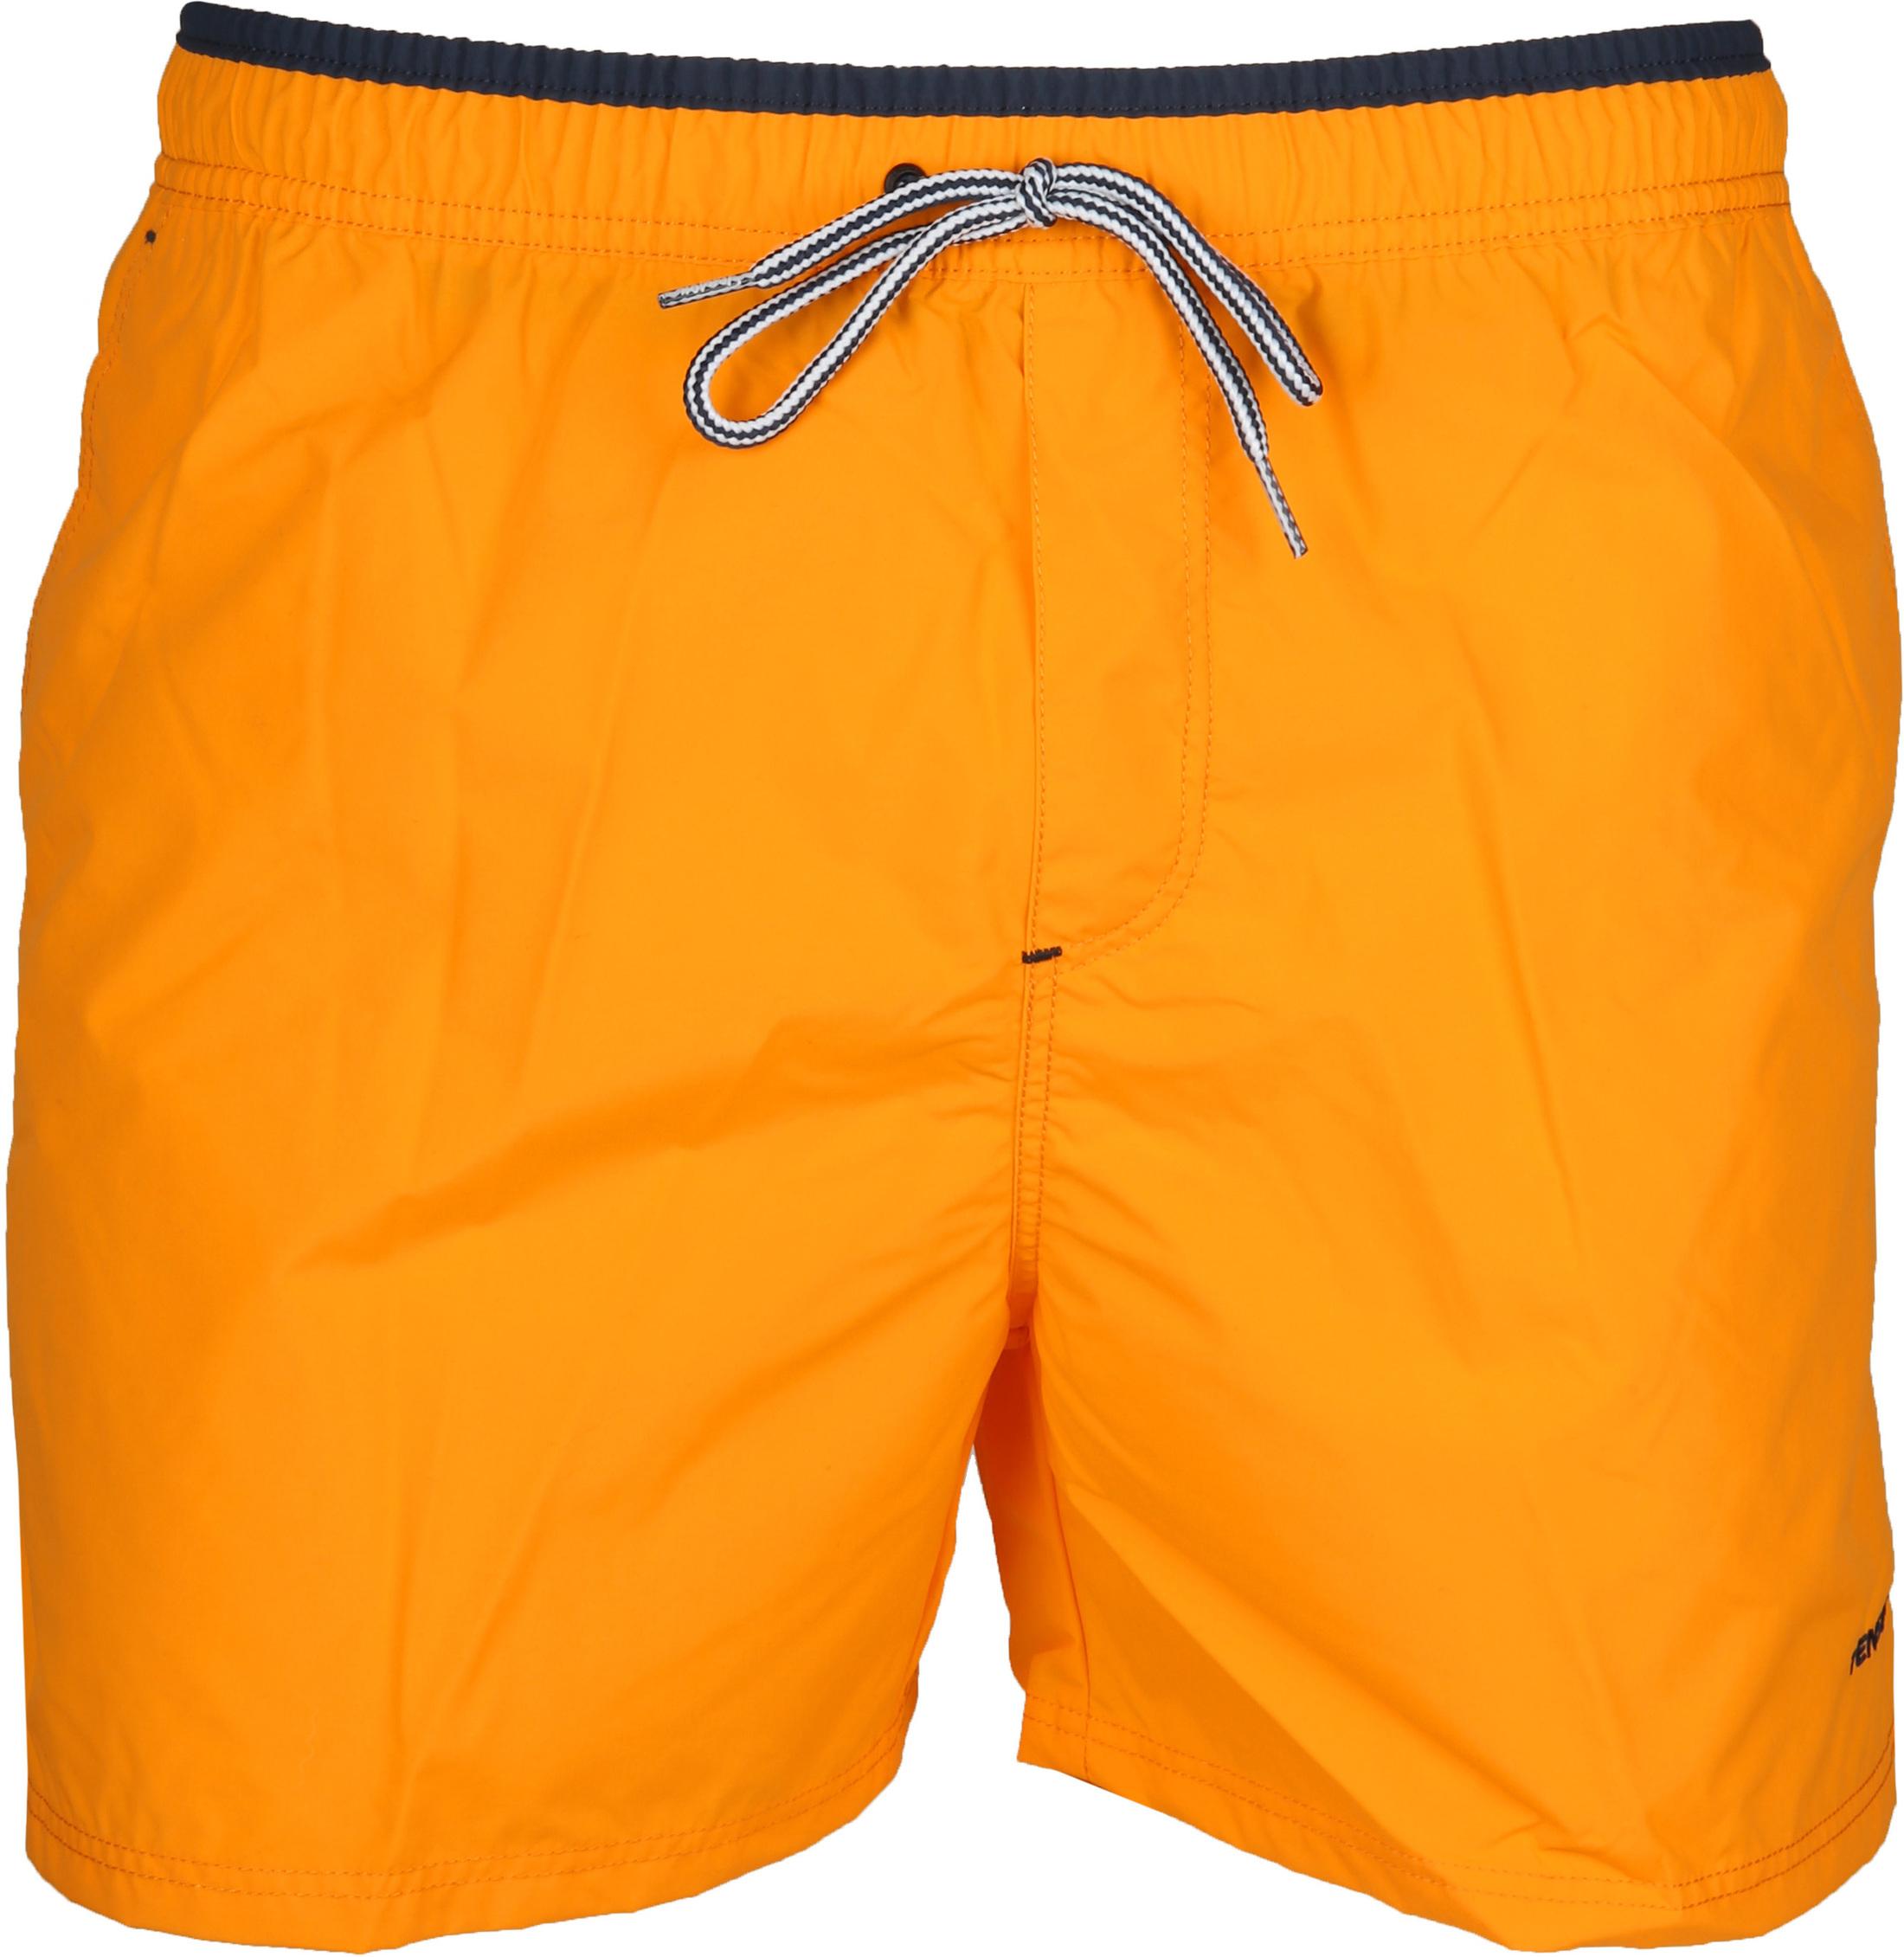 Tenson Swimshort Kos Yellow photo 0